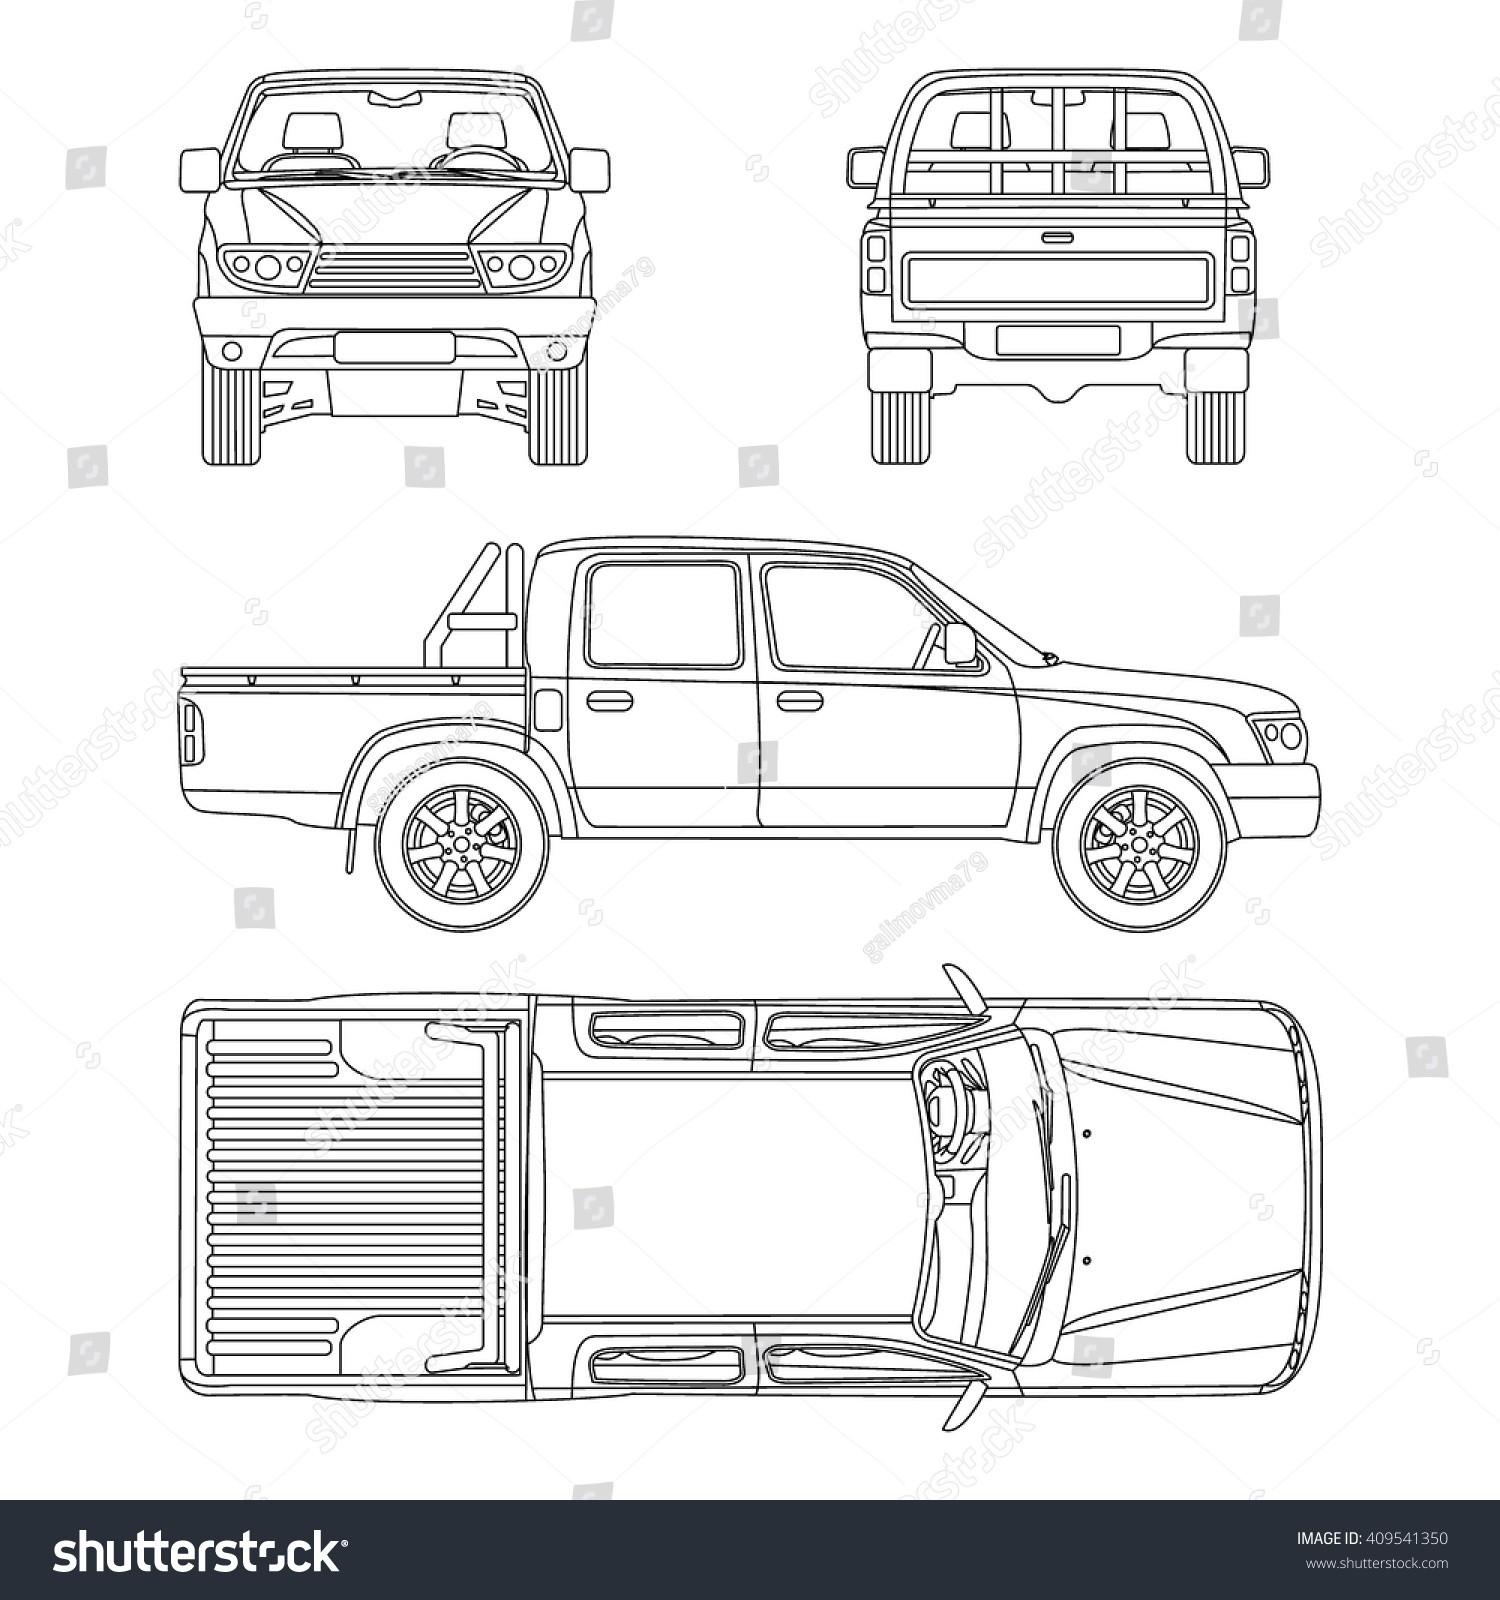 hight resolution of car inspection diagram damage inspection diagram moreover vehicle damage inspection diagram moreover vehicle damage report diagram